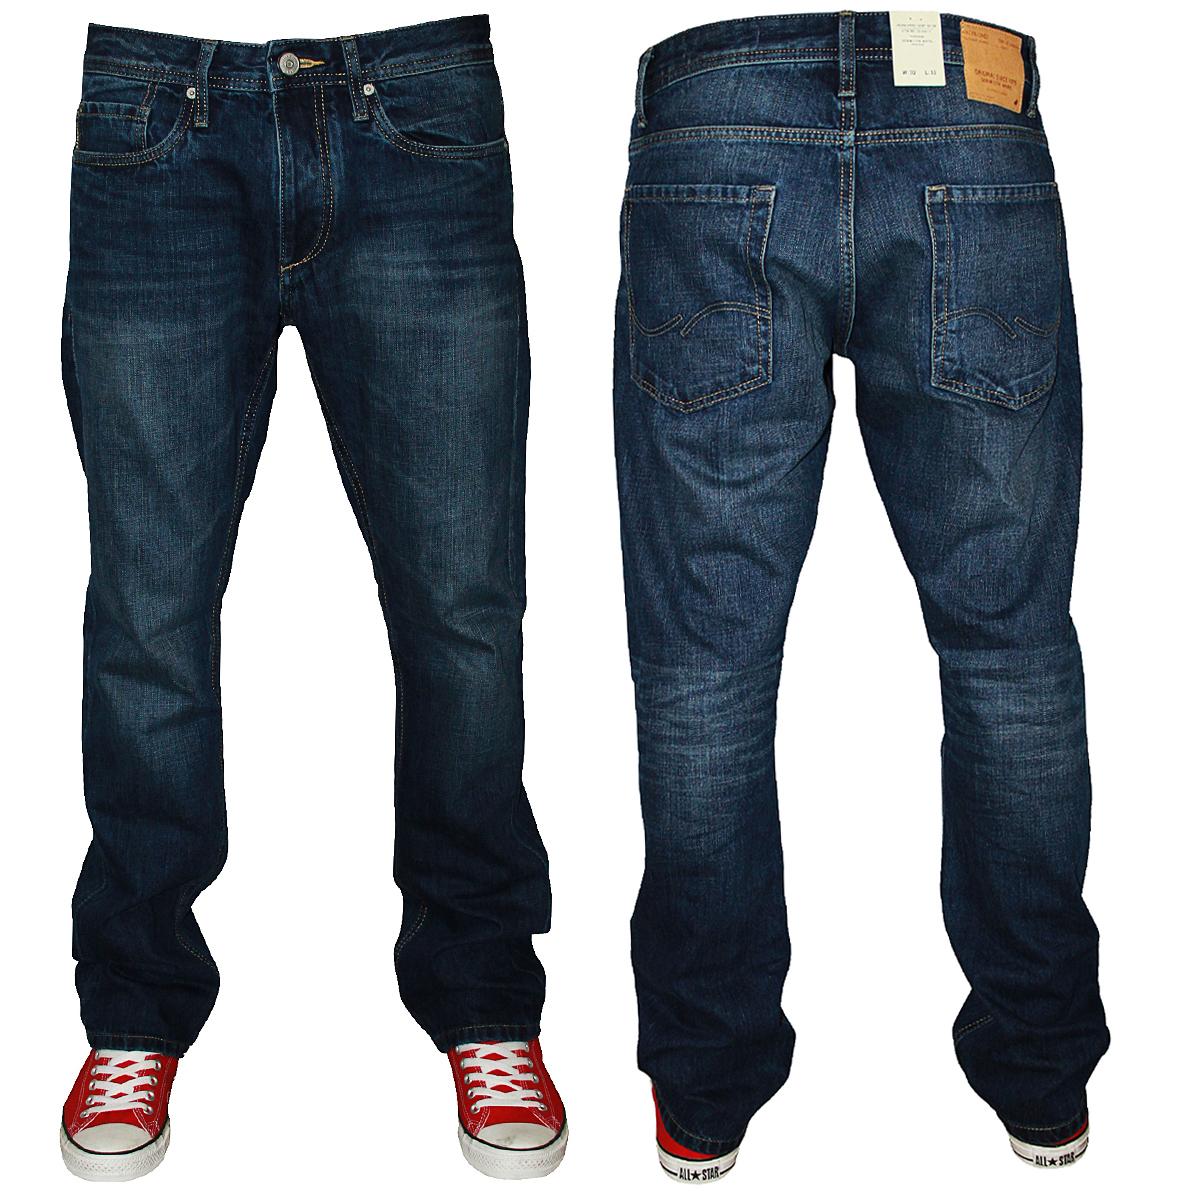 jack jones clark blue mens original regular fit jeans all waist leg sizes ebay. Black Bedroom Furniture Sets. Home Design Ideas